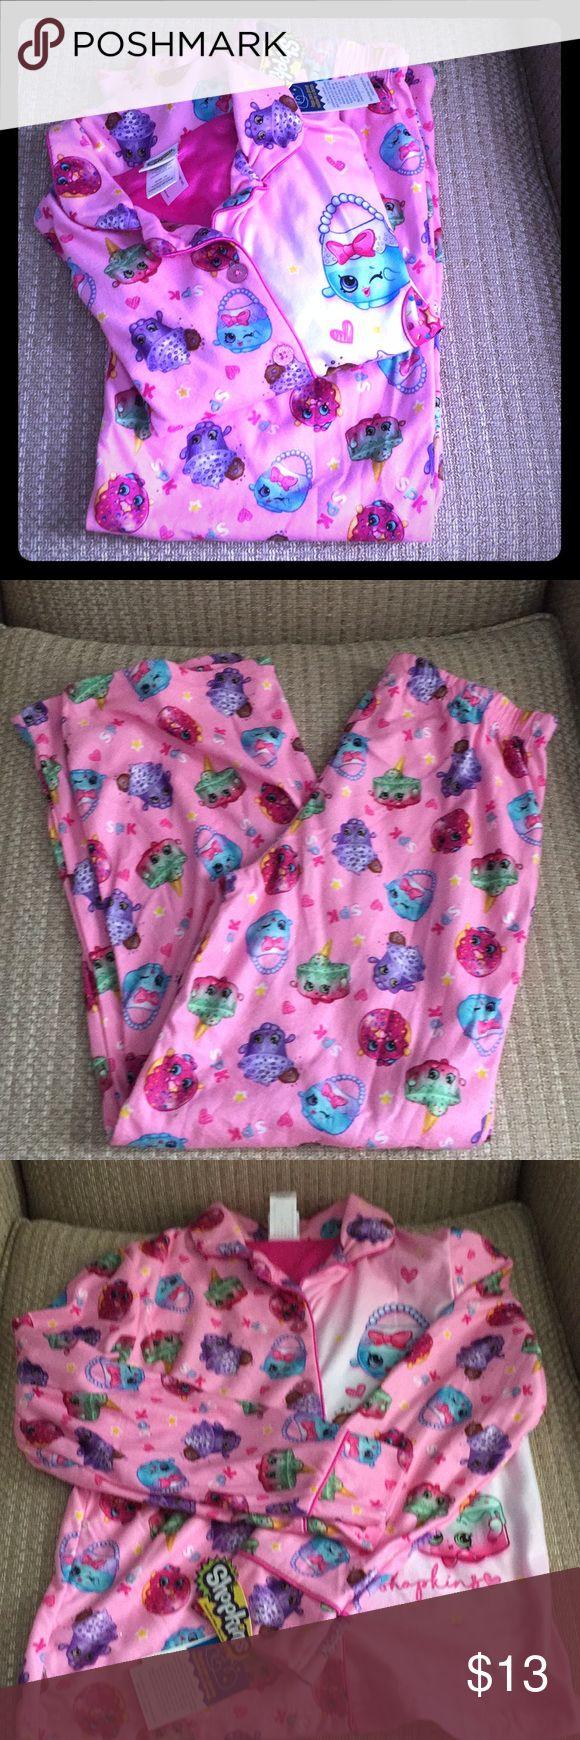 Girls Shopkins Pajamas Size 10 Adorable girls pajamas. Never worn! Shopkins Pajamas Pajama Sets